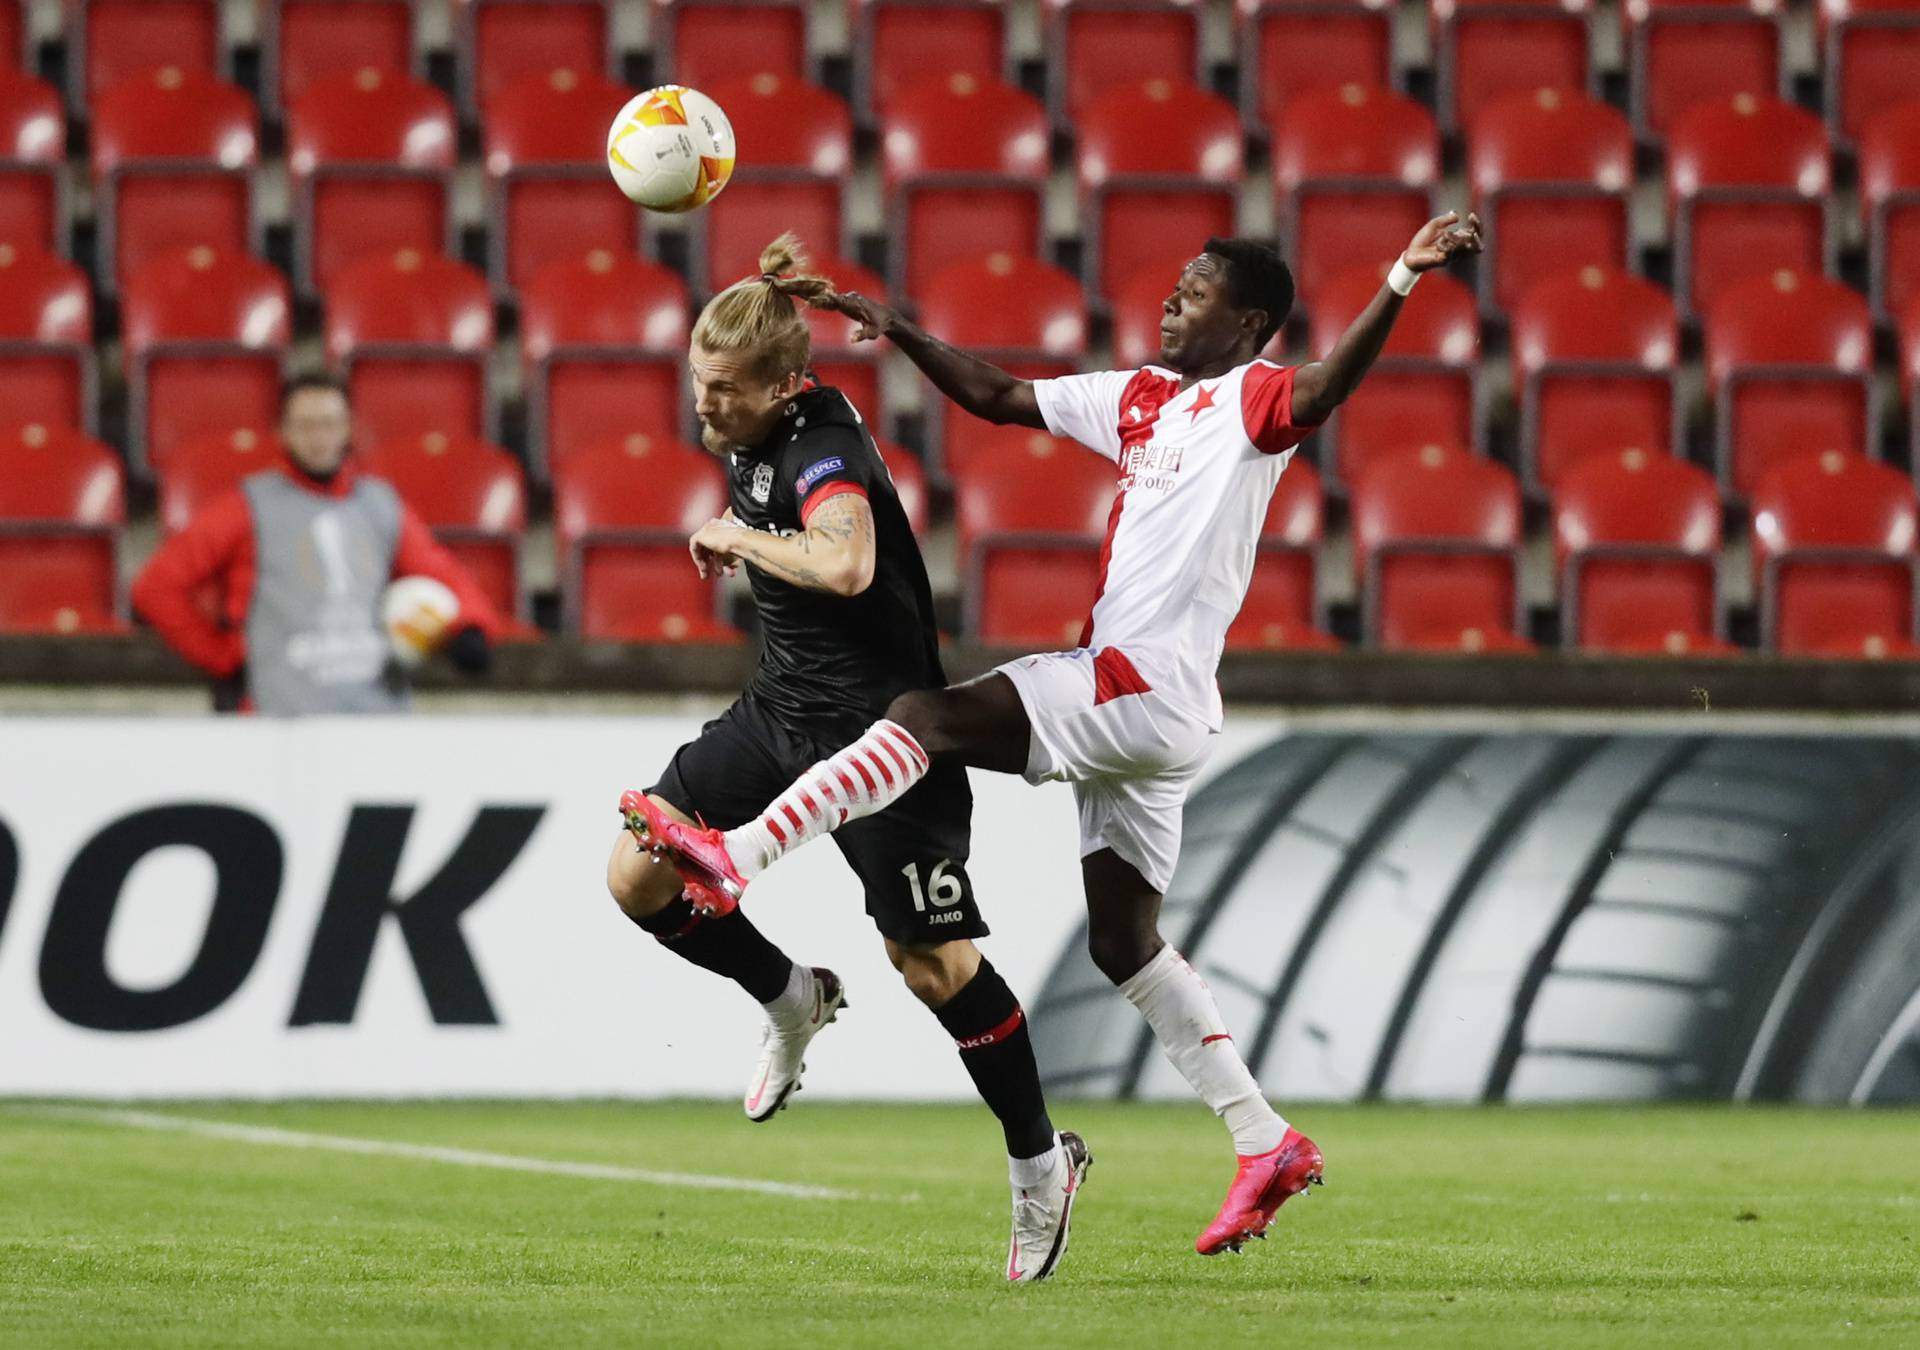 Europa League - Group C - Slavia Prague v Bayer Leverkusen